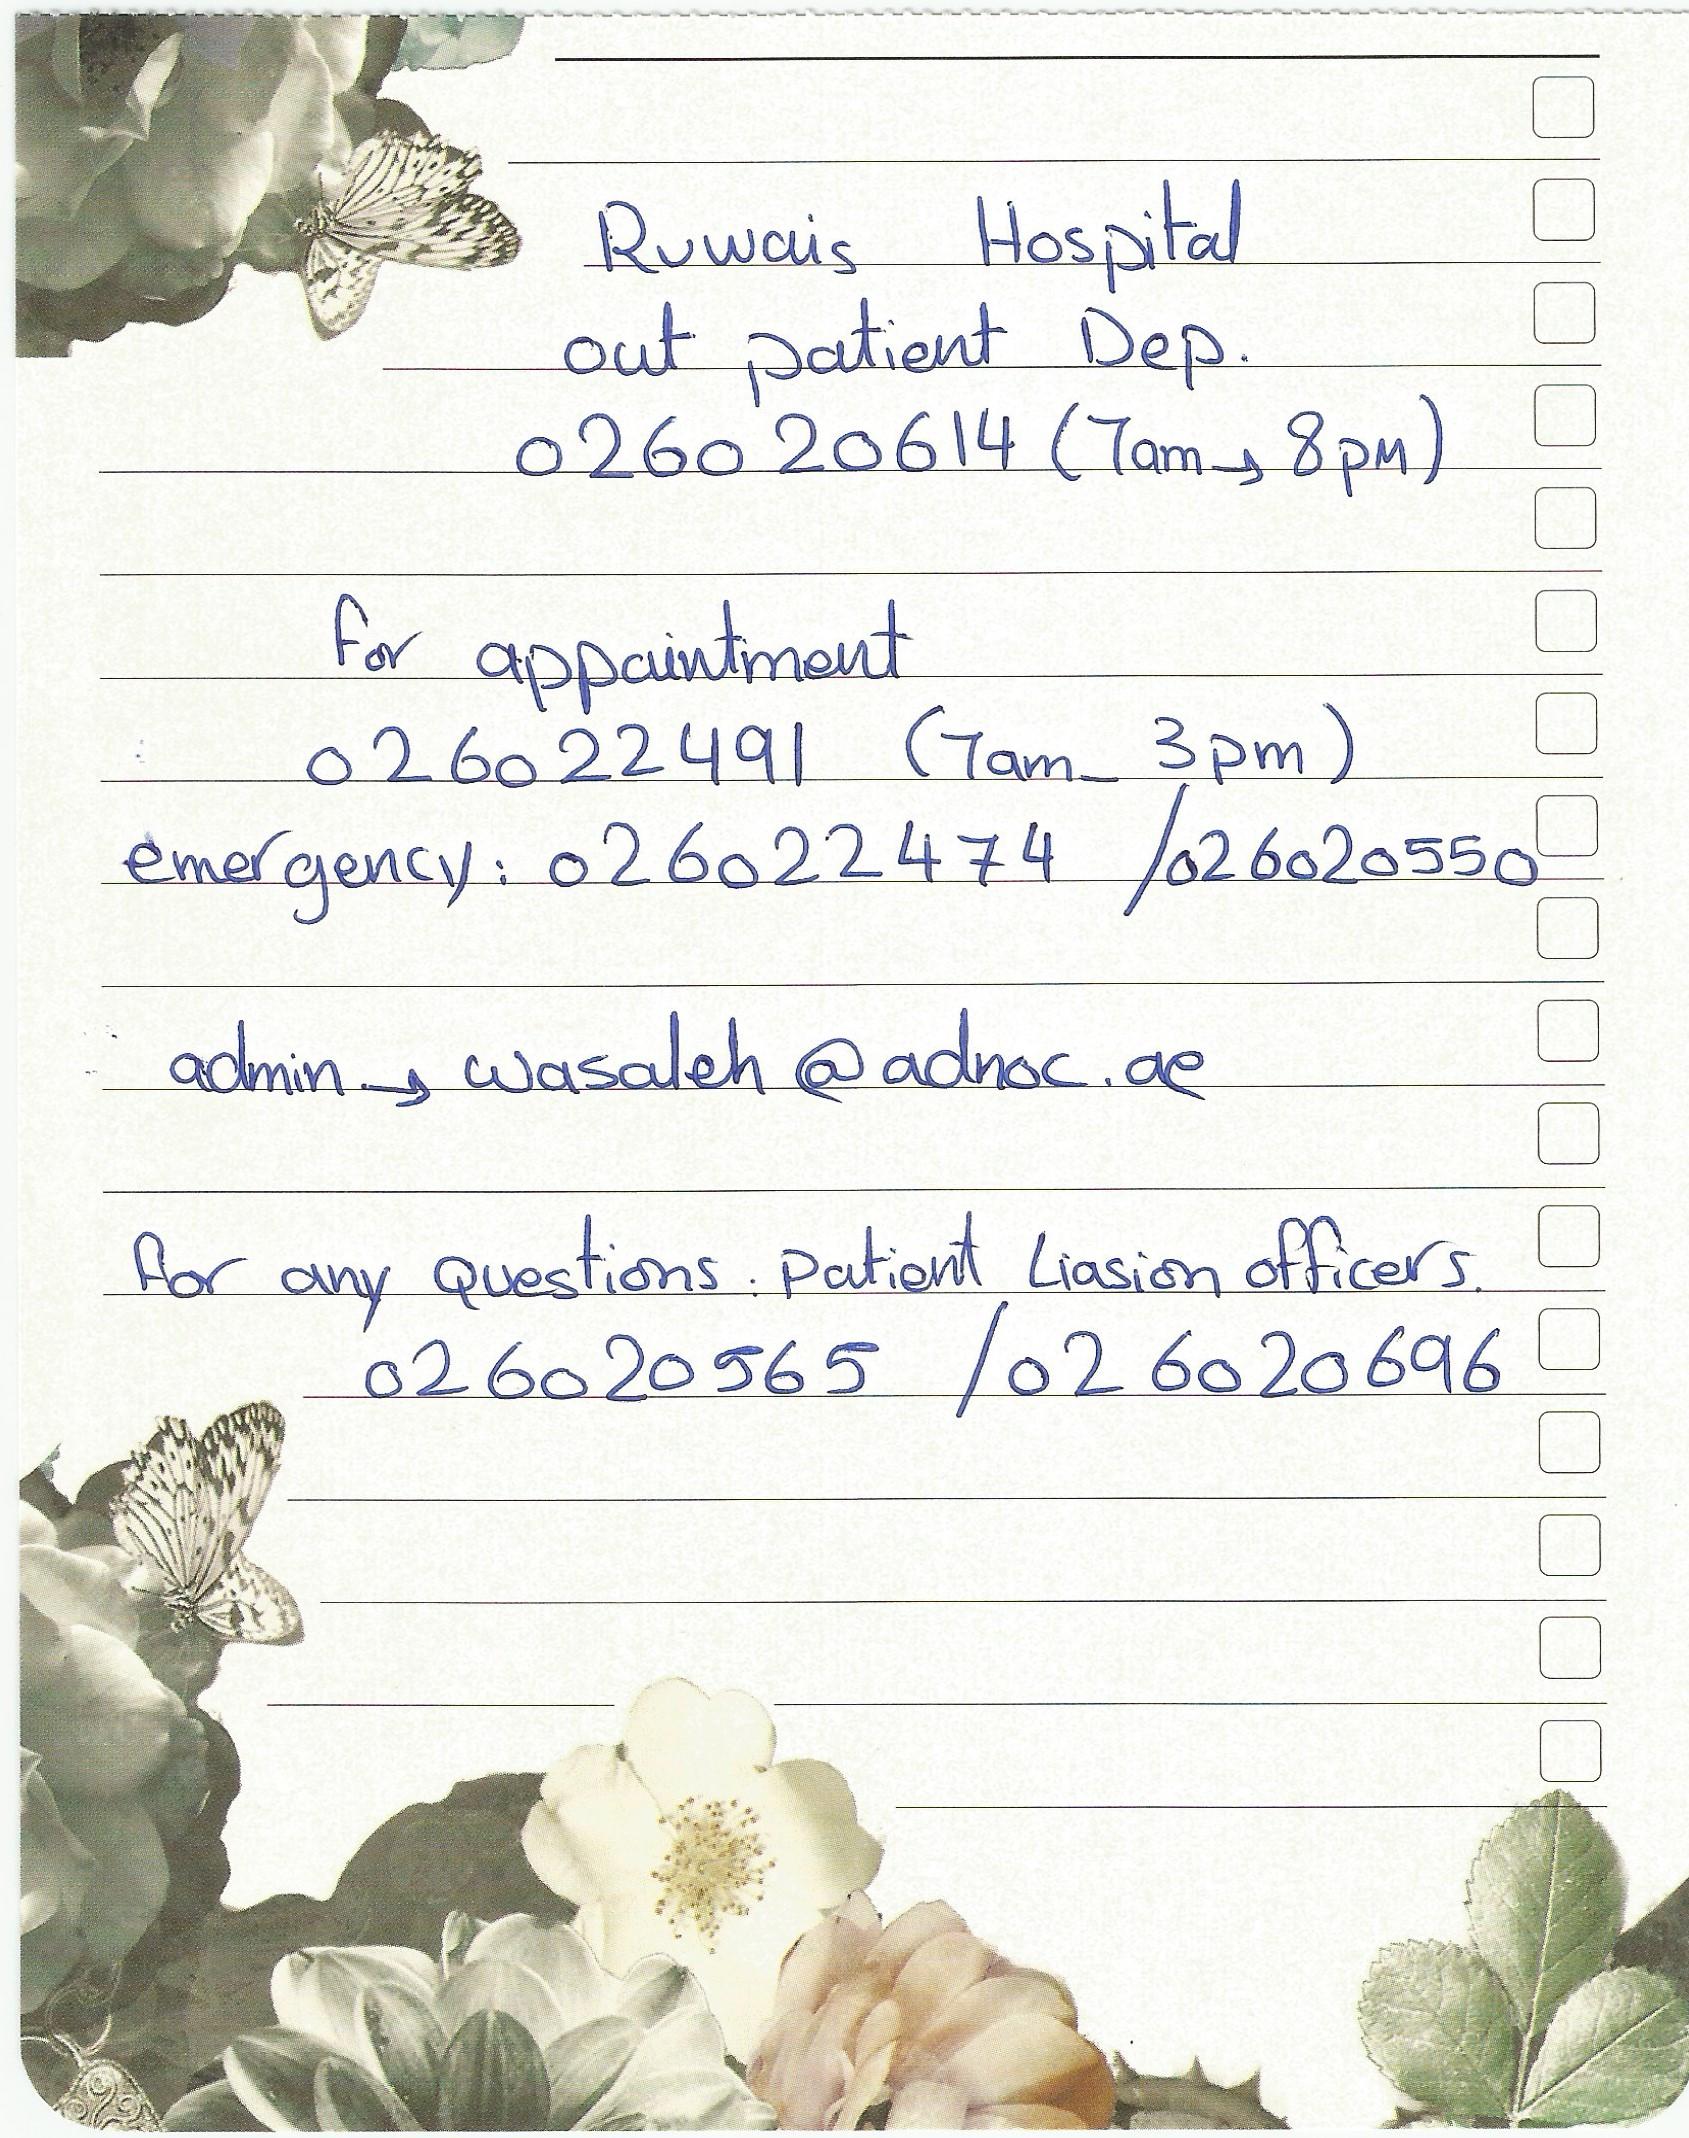 Ruwais Hospital Contacts